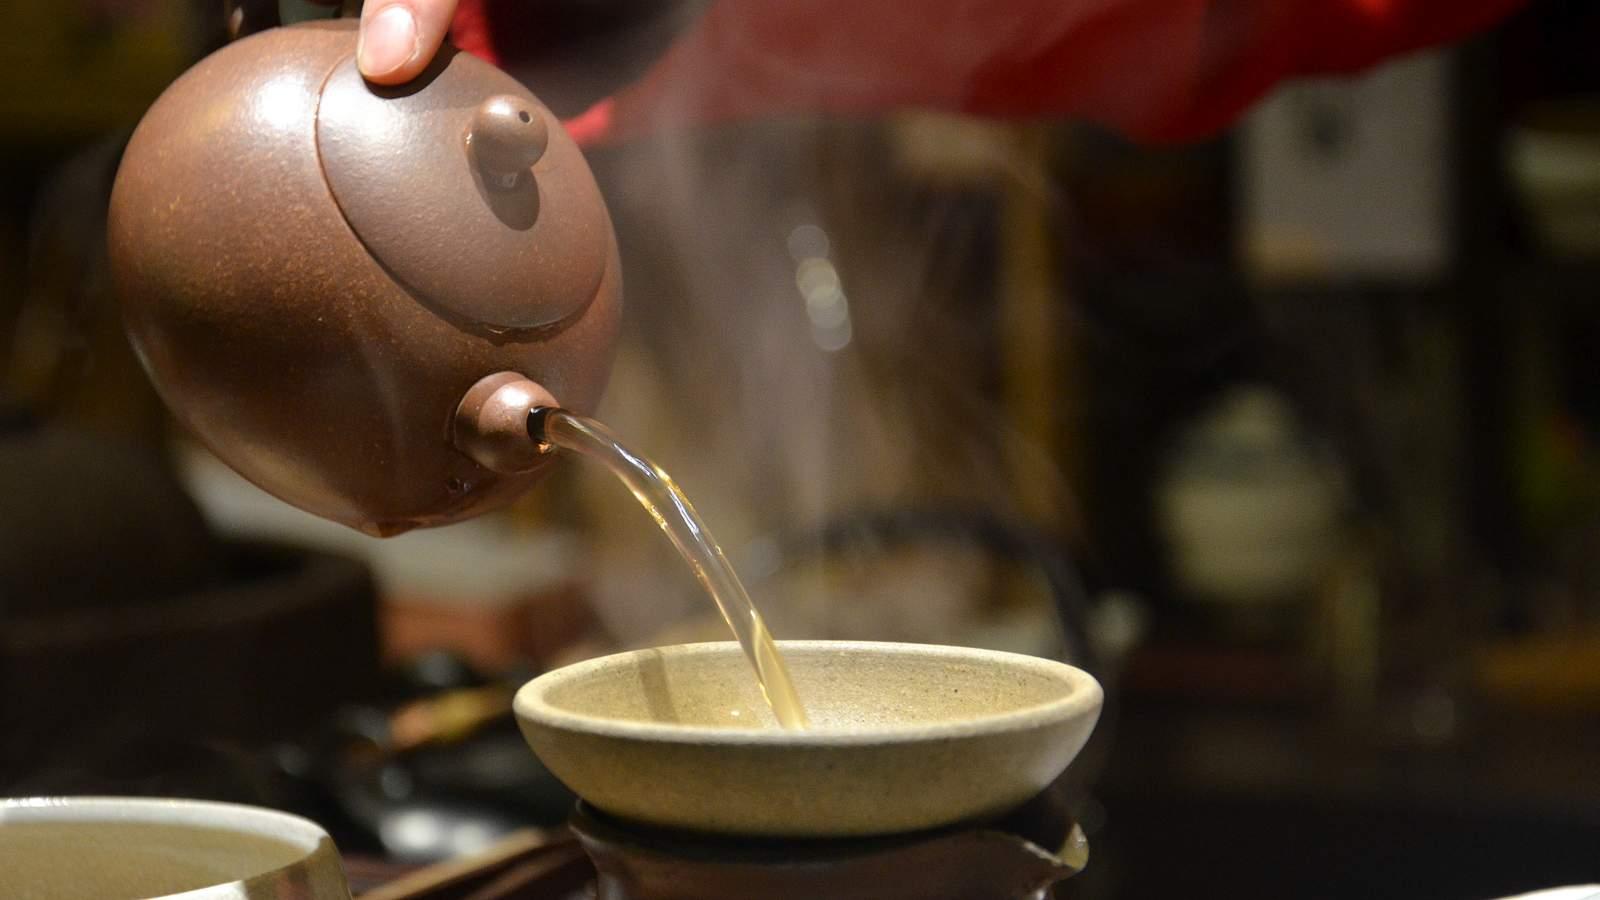 CNNP raw Pu-erh blend 7542, red label from 1996 of Menghai tea factory, rinse and awaken